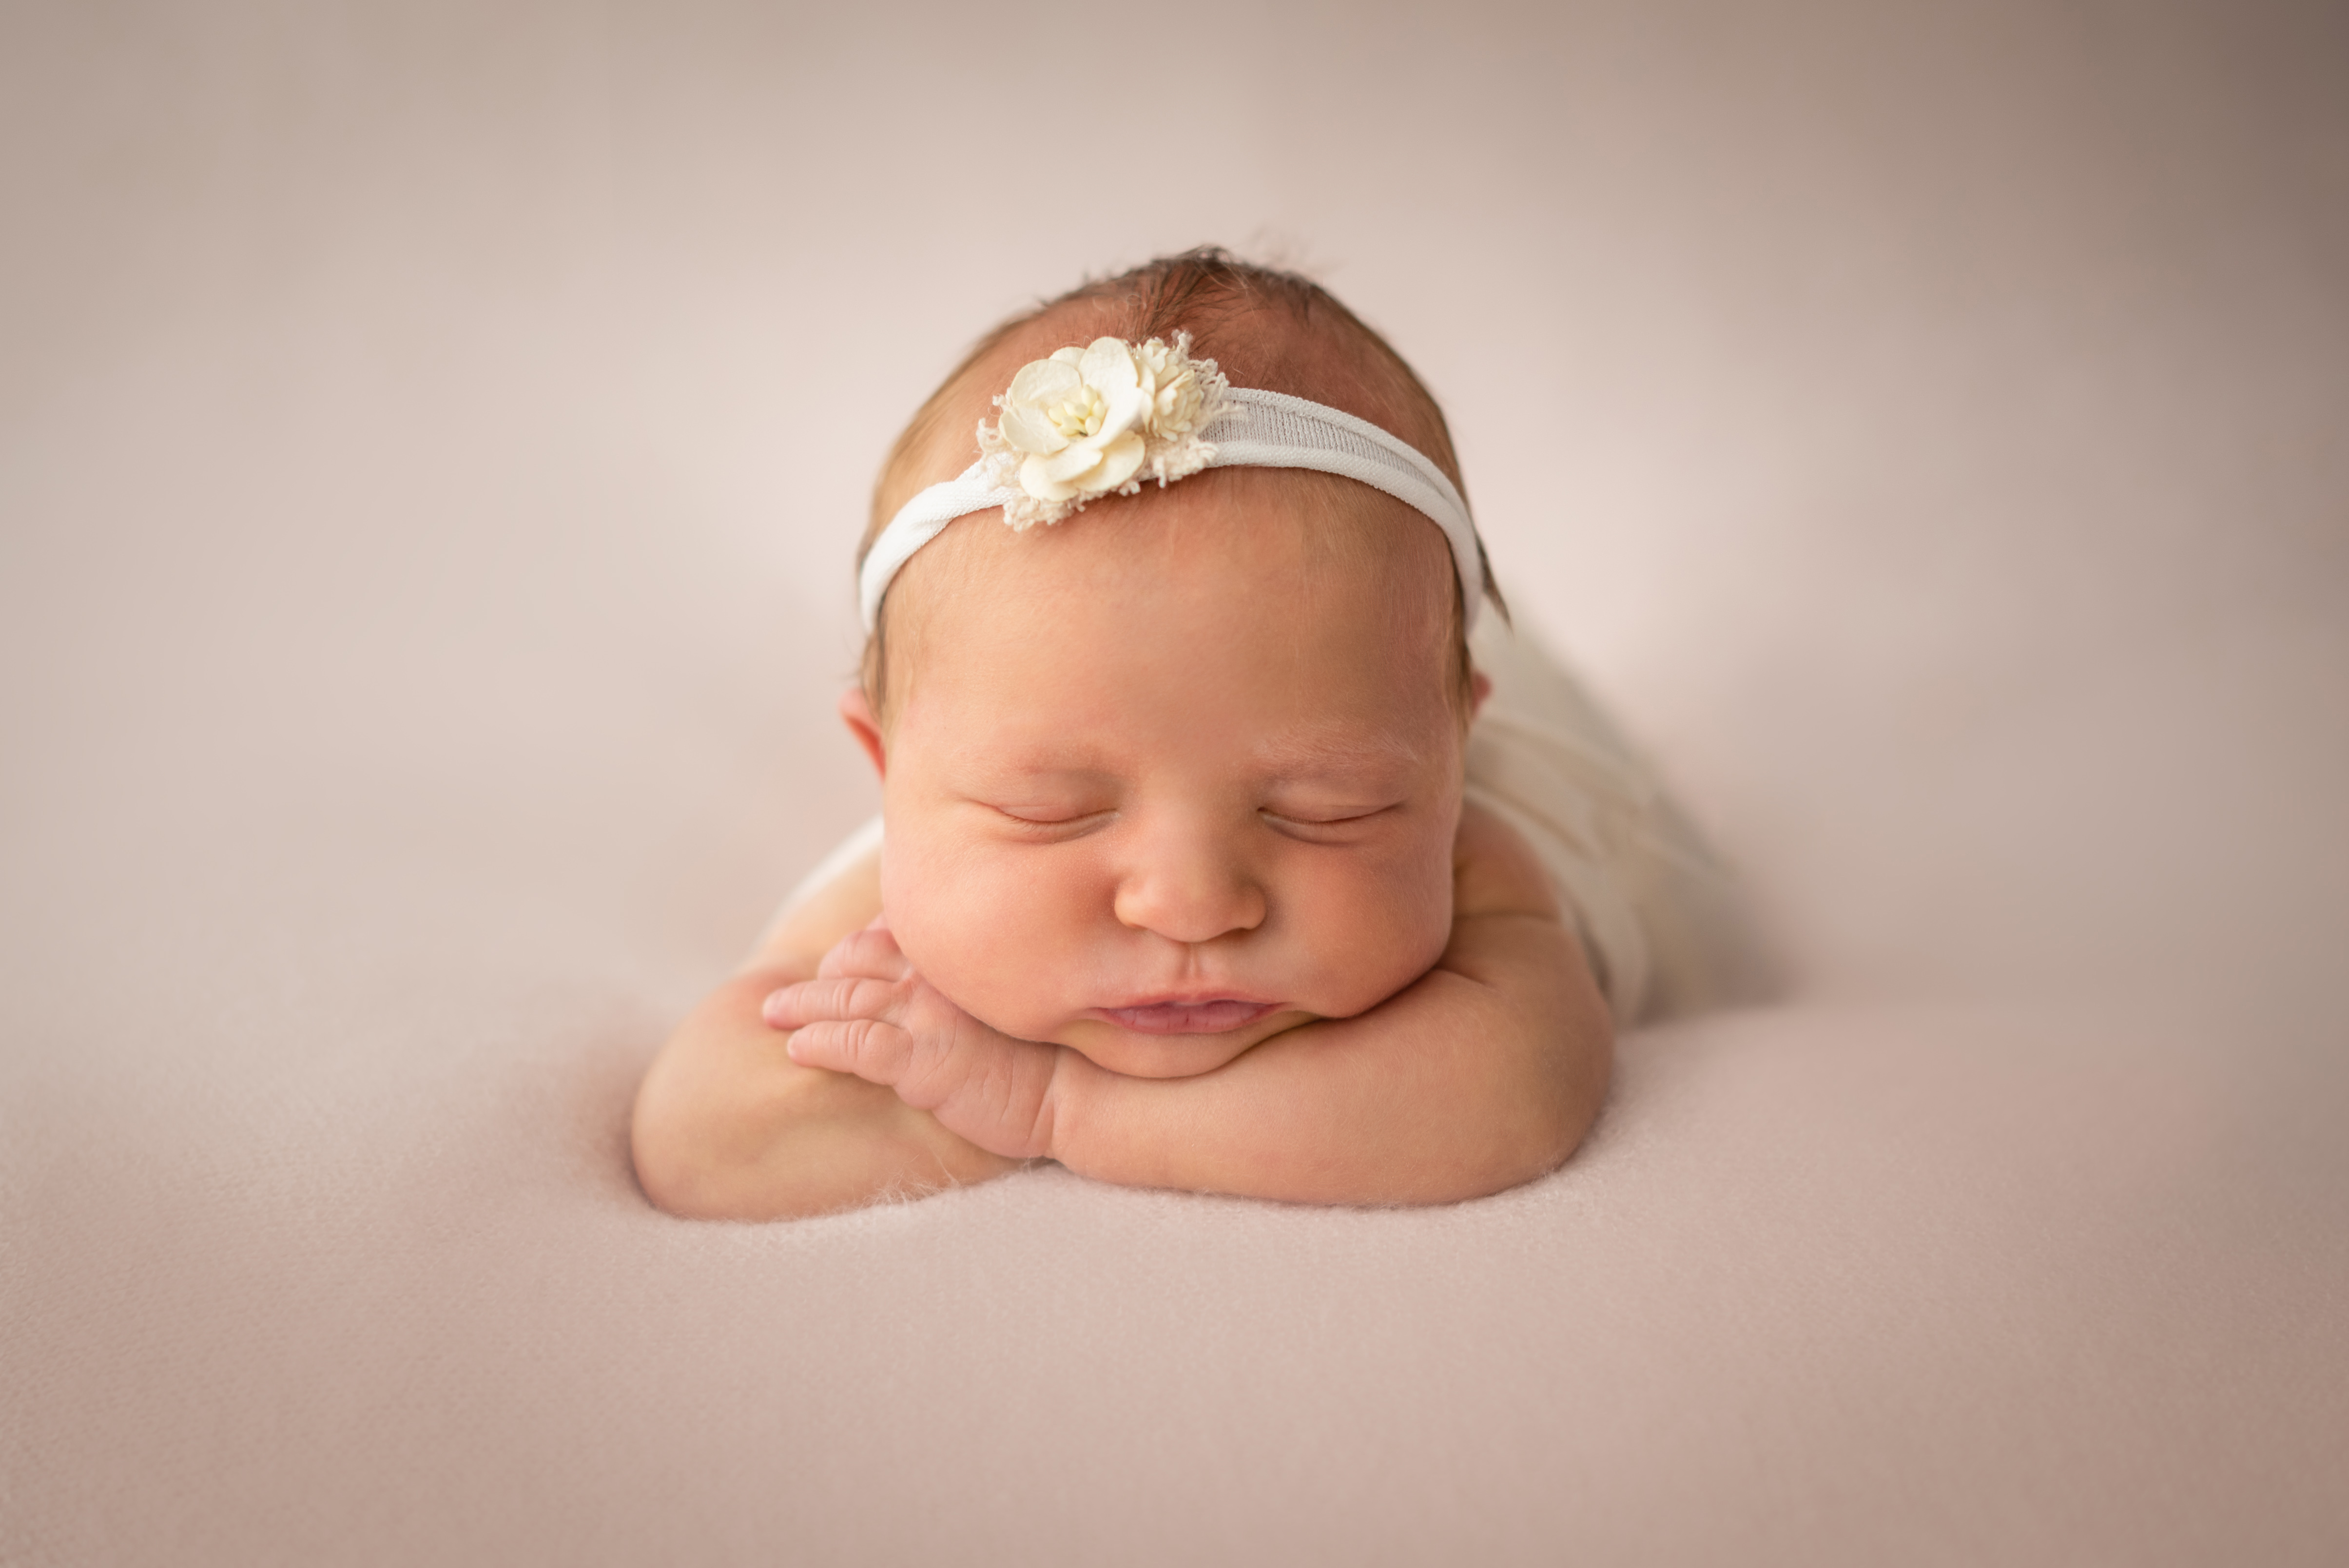 Newbornfotoshooting